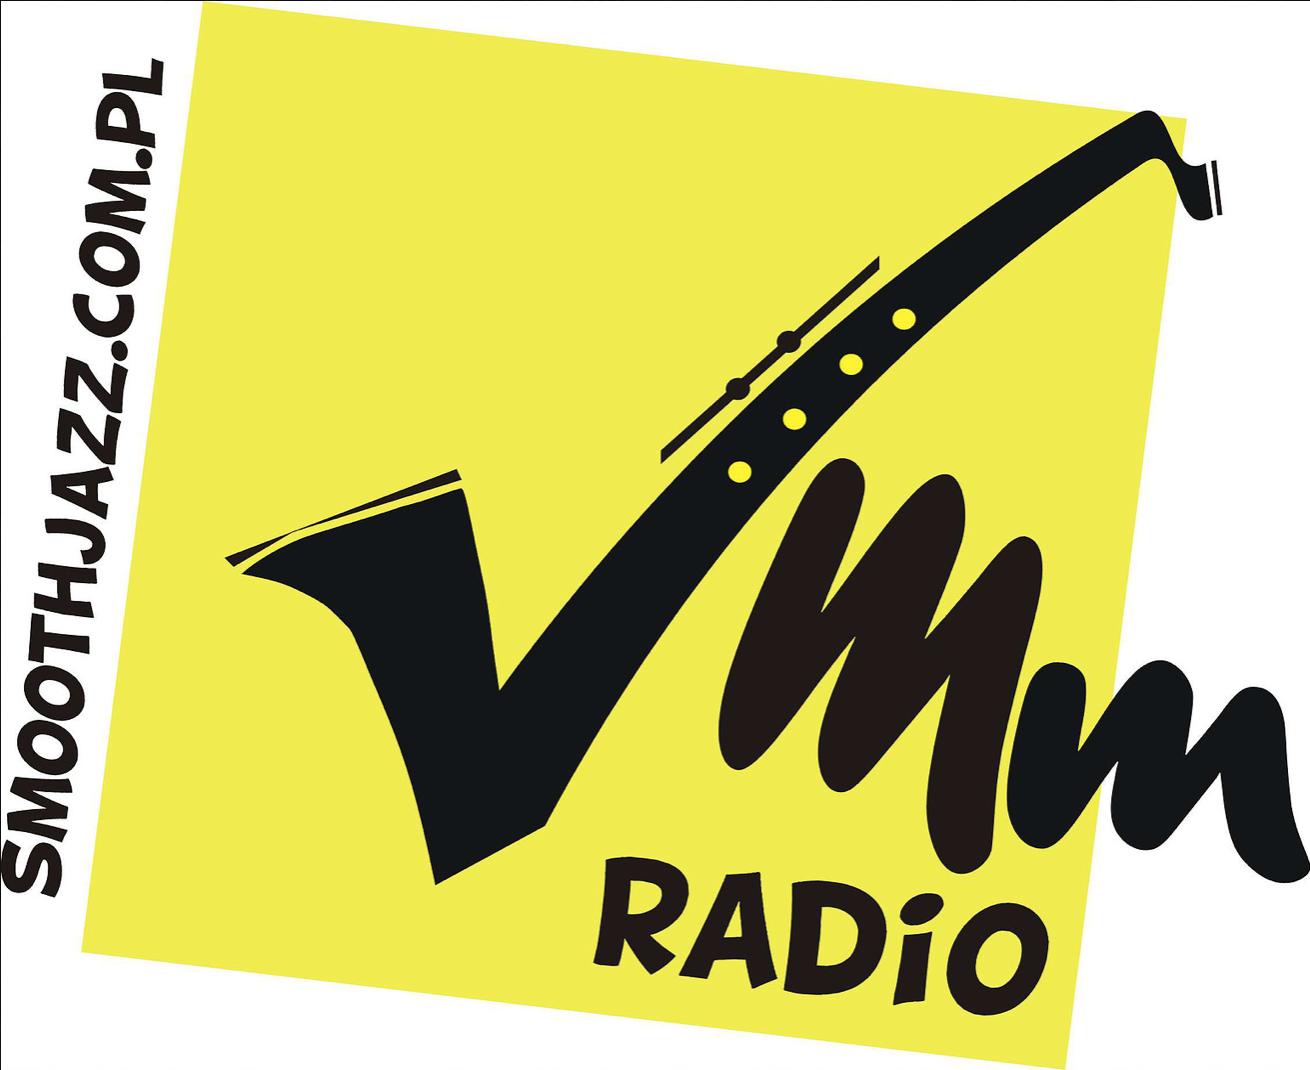 Radio Stations Guide | SmoothJazz com